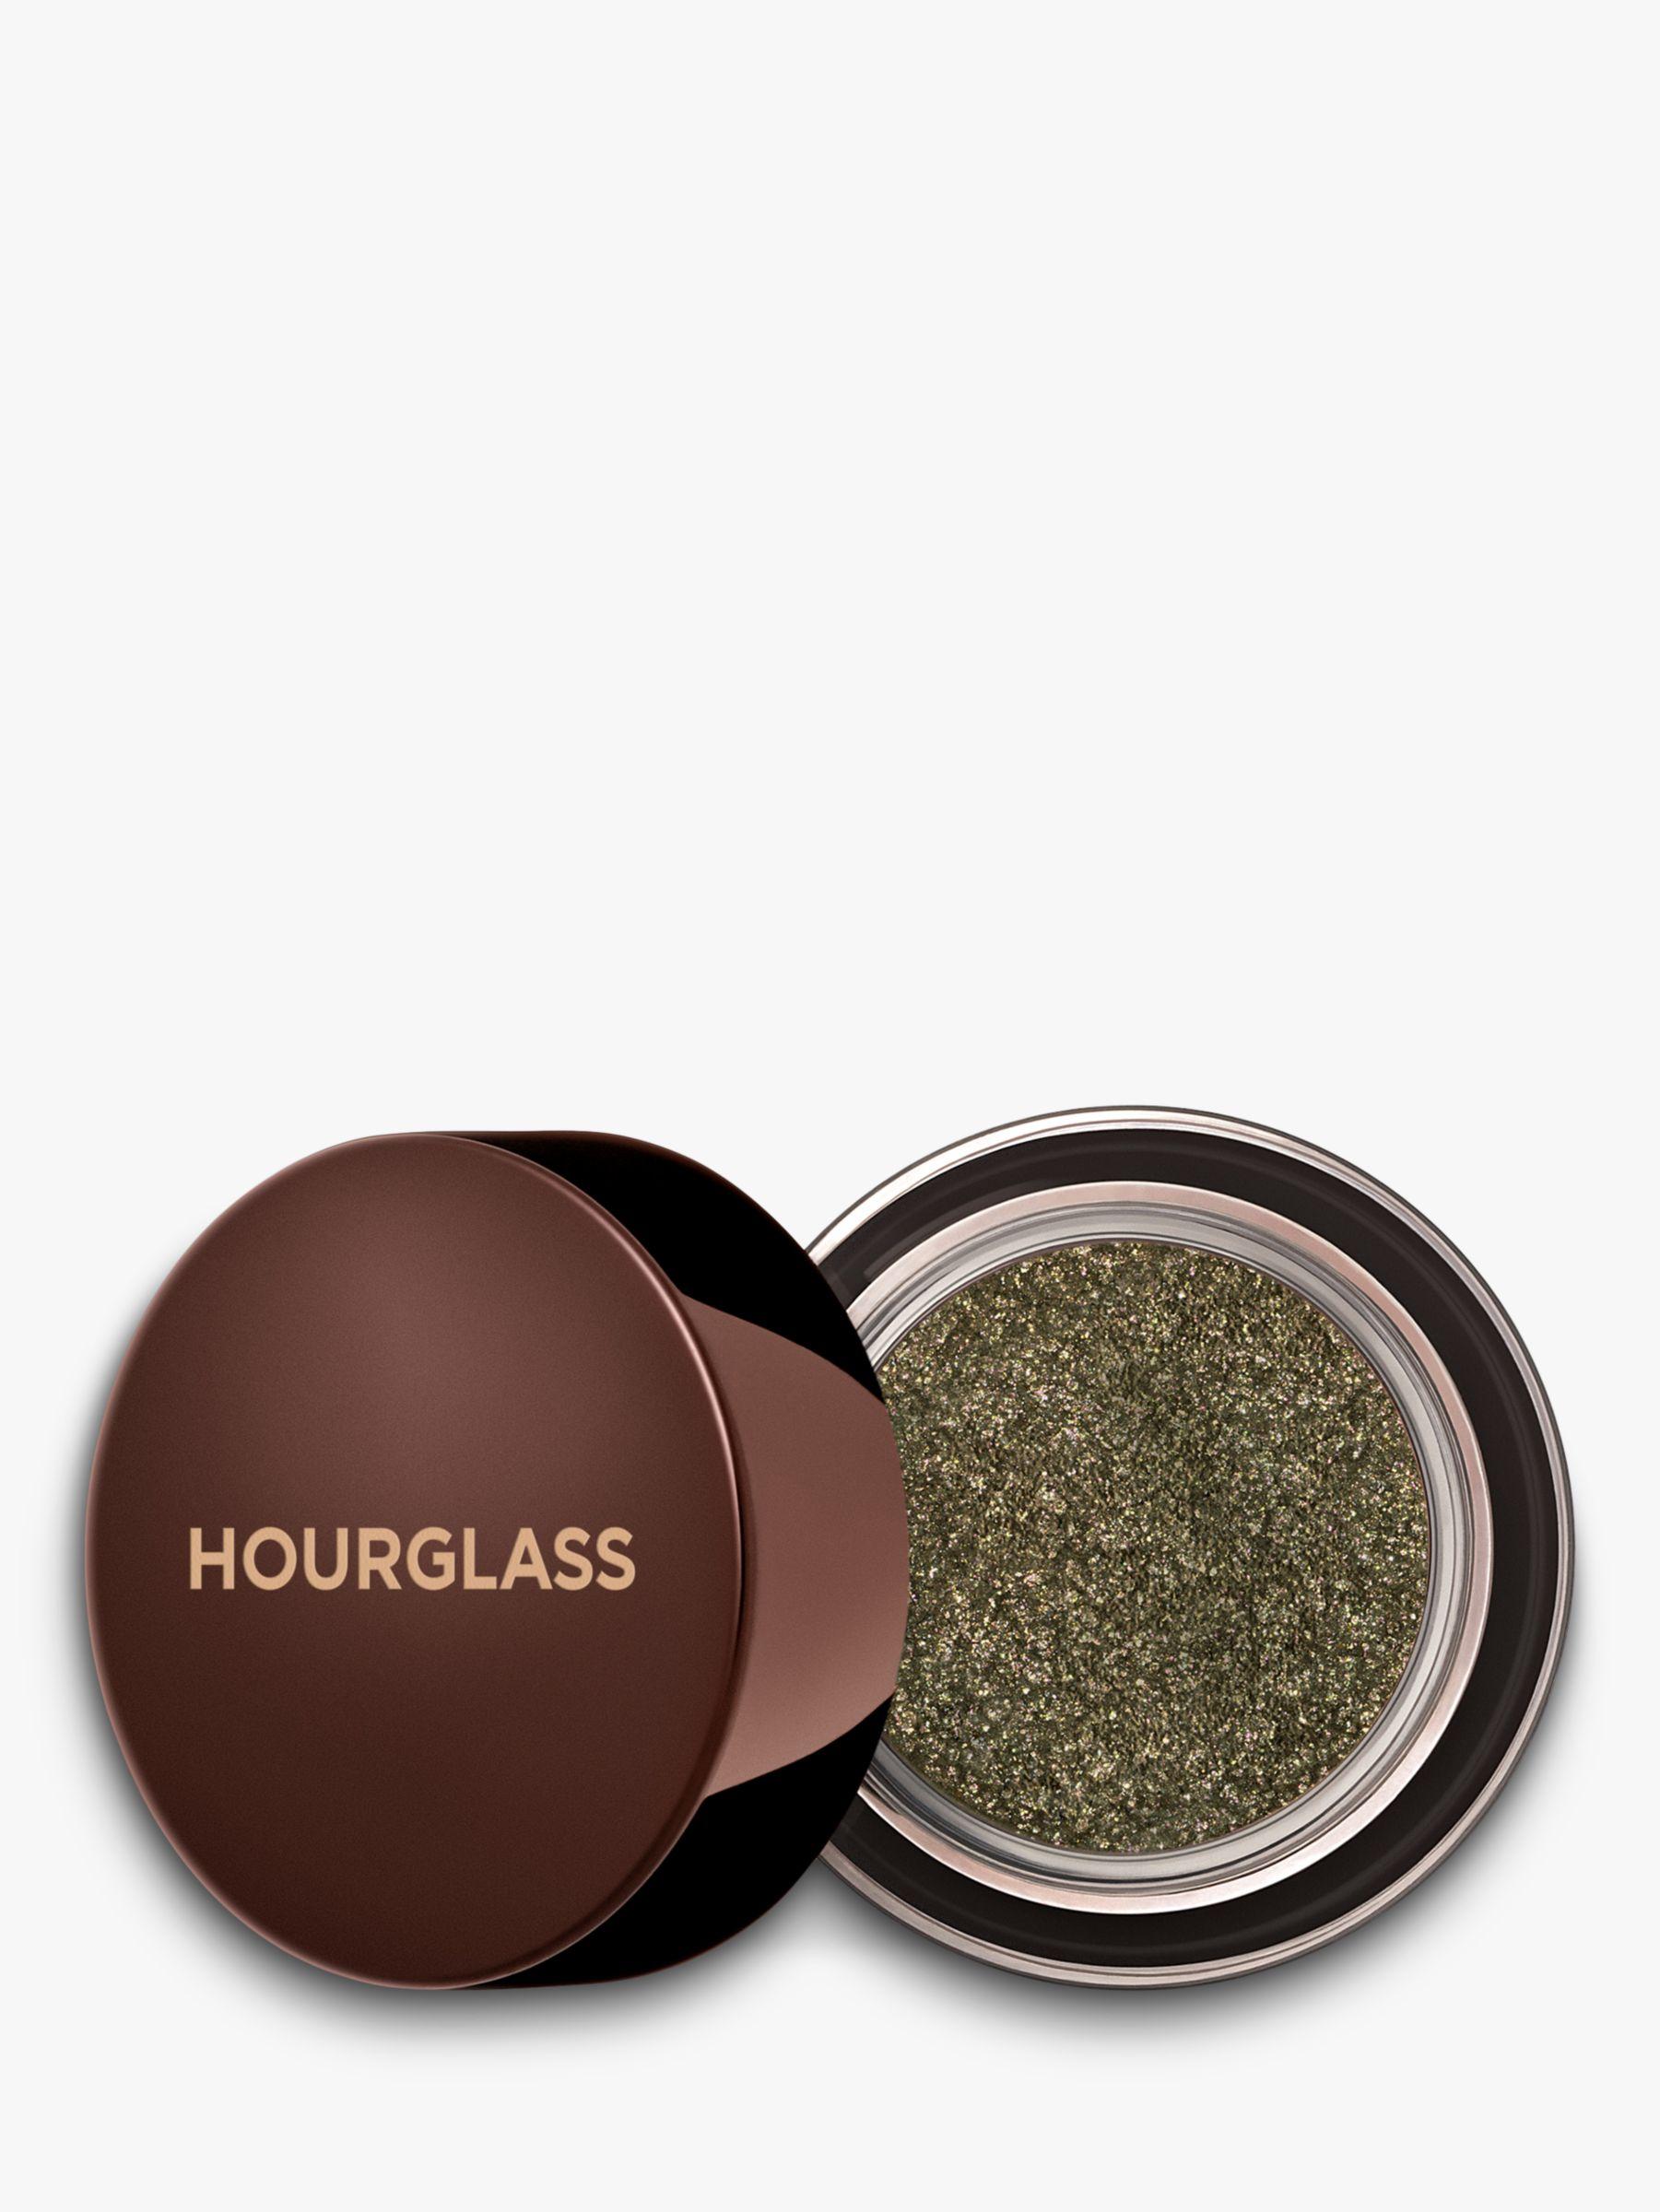 Hourglass Hourglass Scattered Light Glitter Eyeshadow